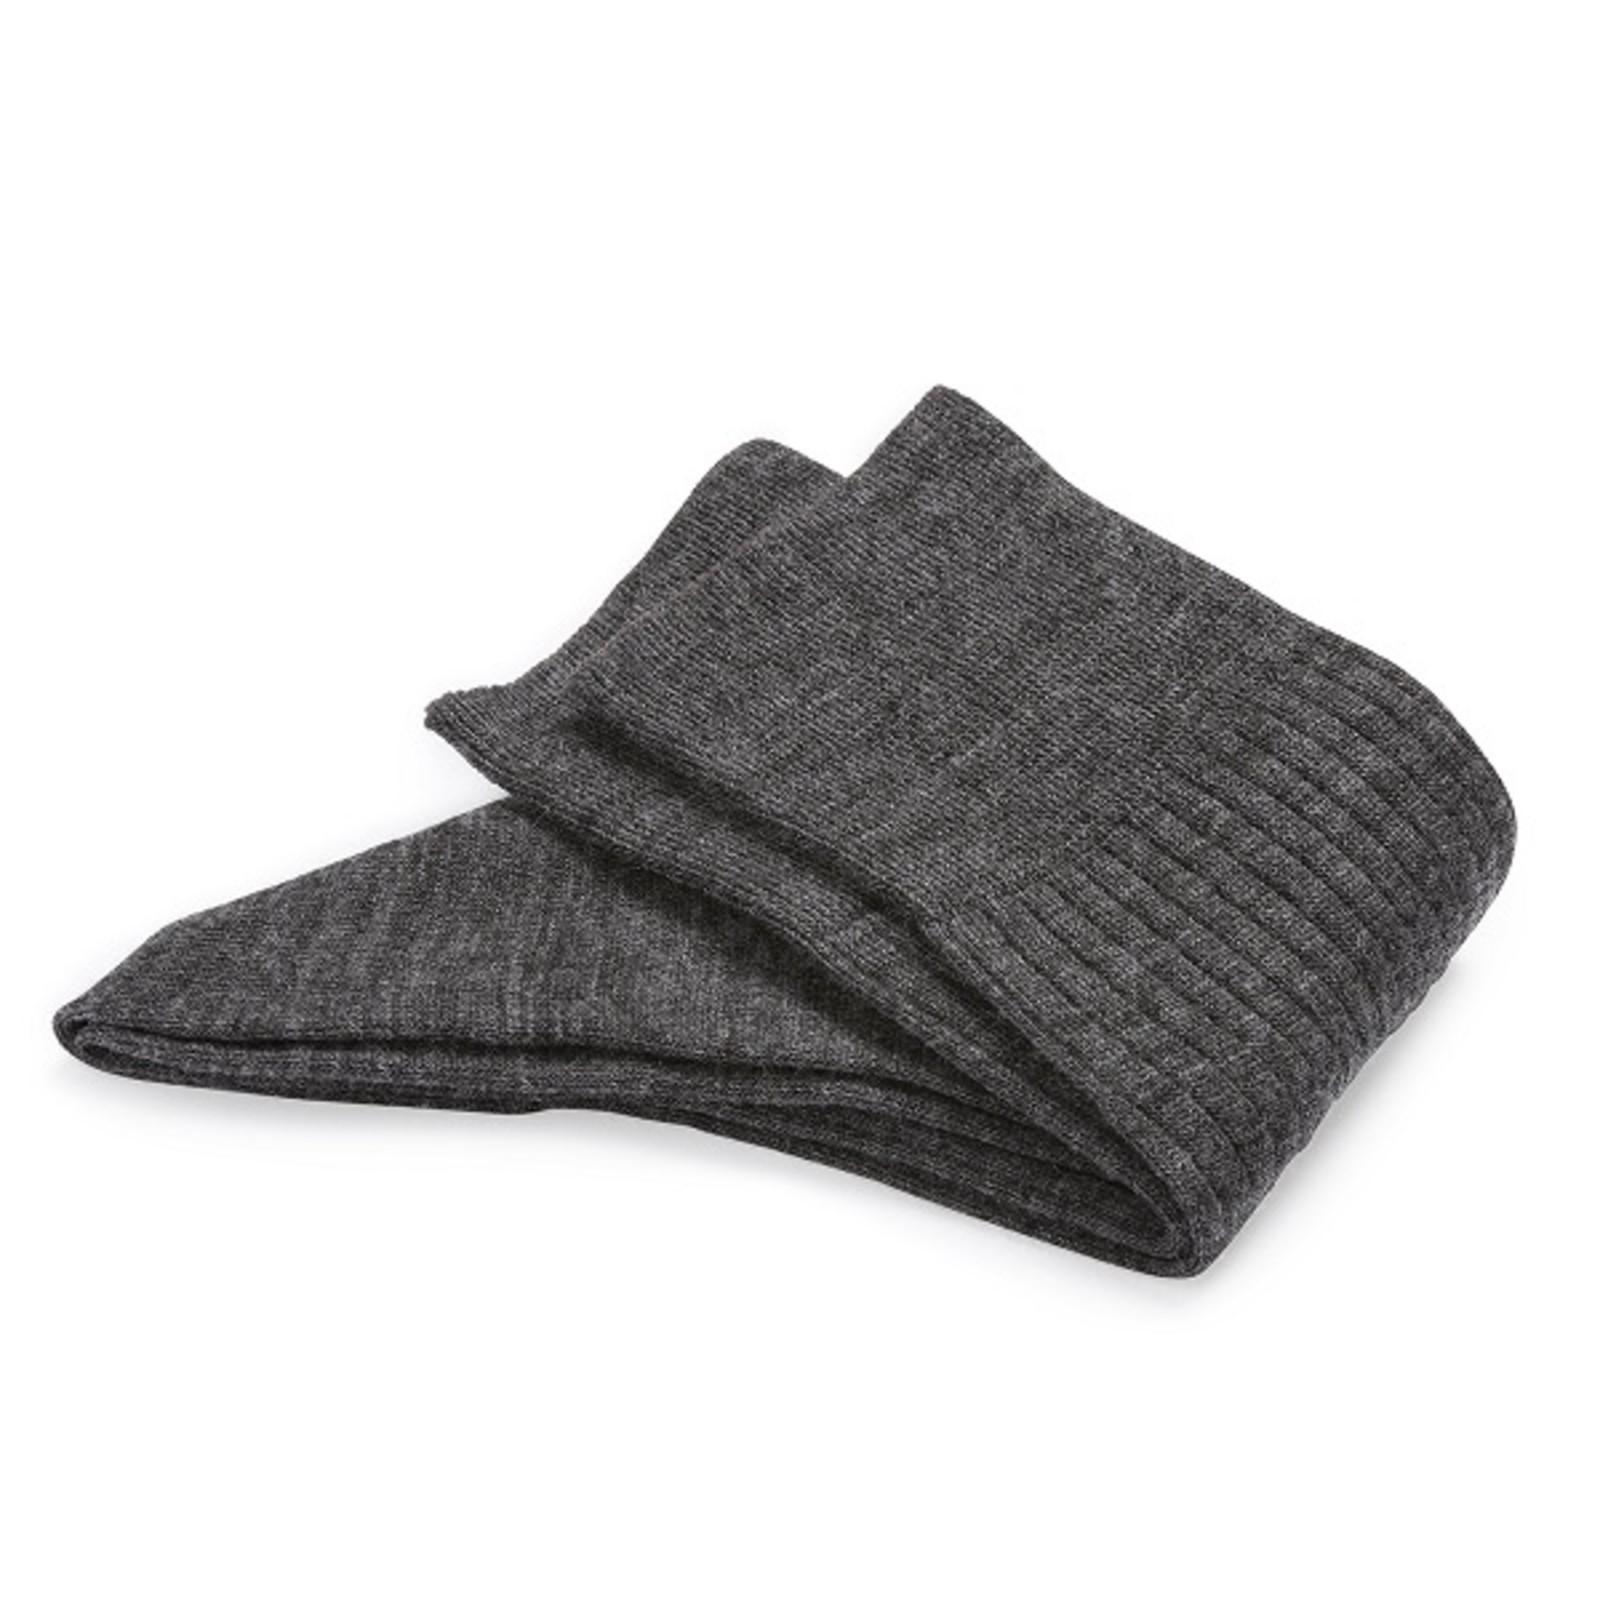 Carlo Lanza Graue Merino Wolle Socken Socken